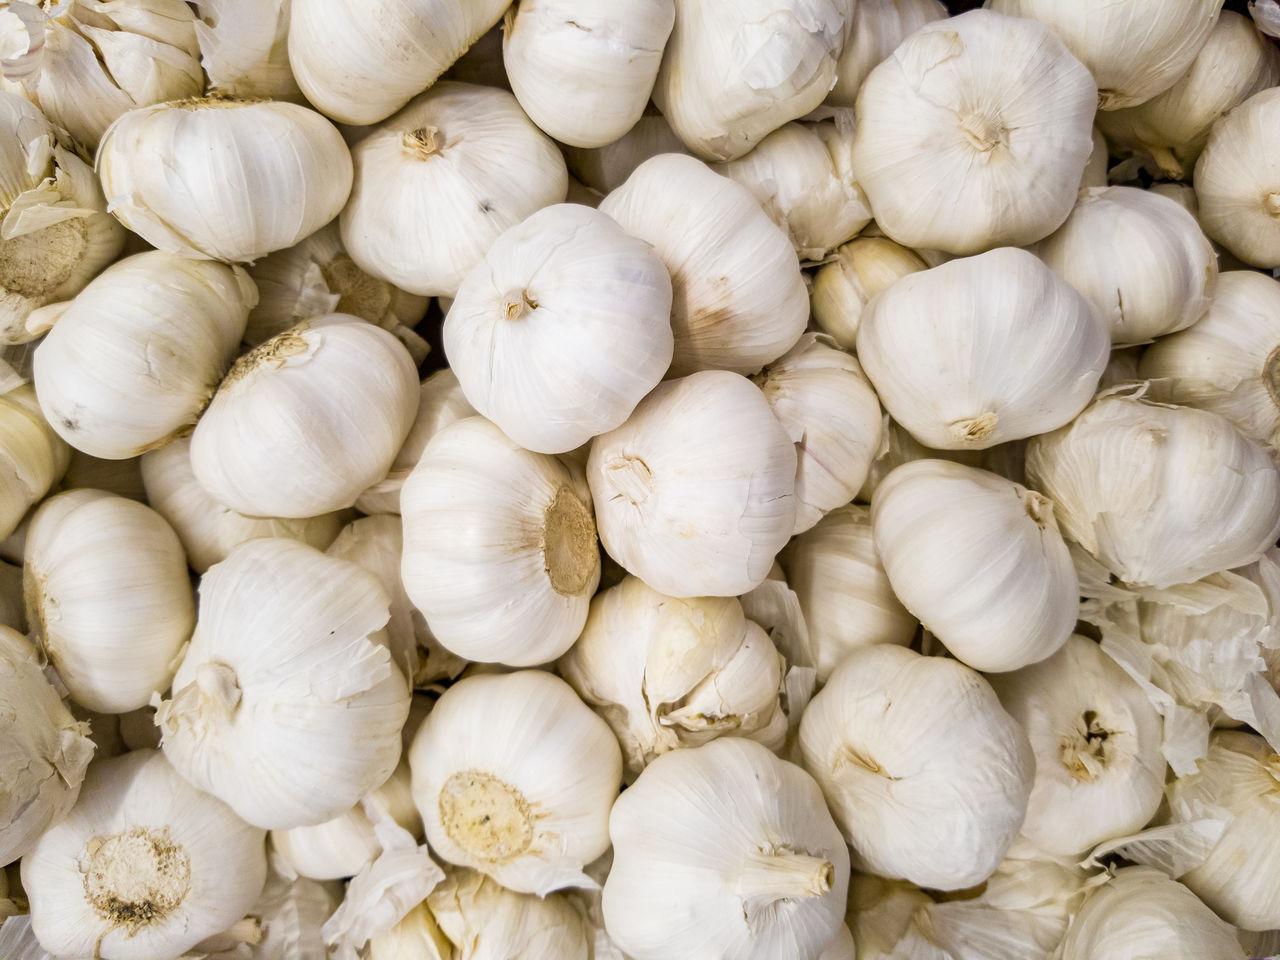 High angle view of pile garlic bulbs, herbs for medicinal purposes.